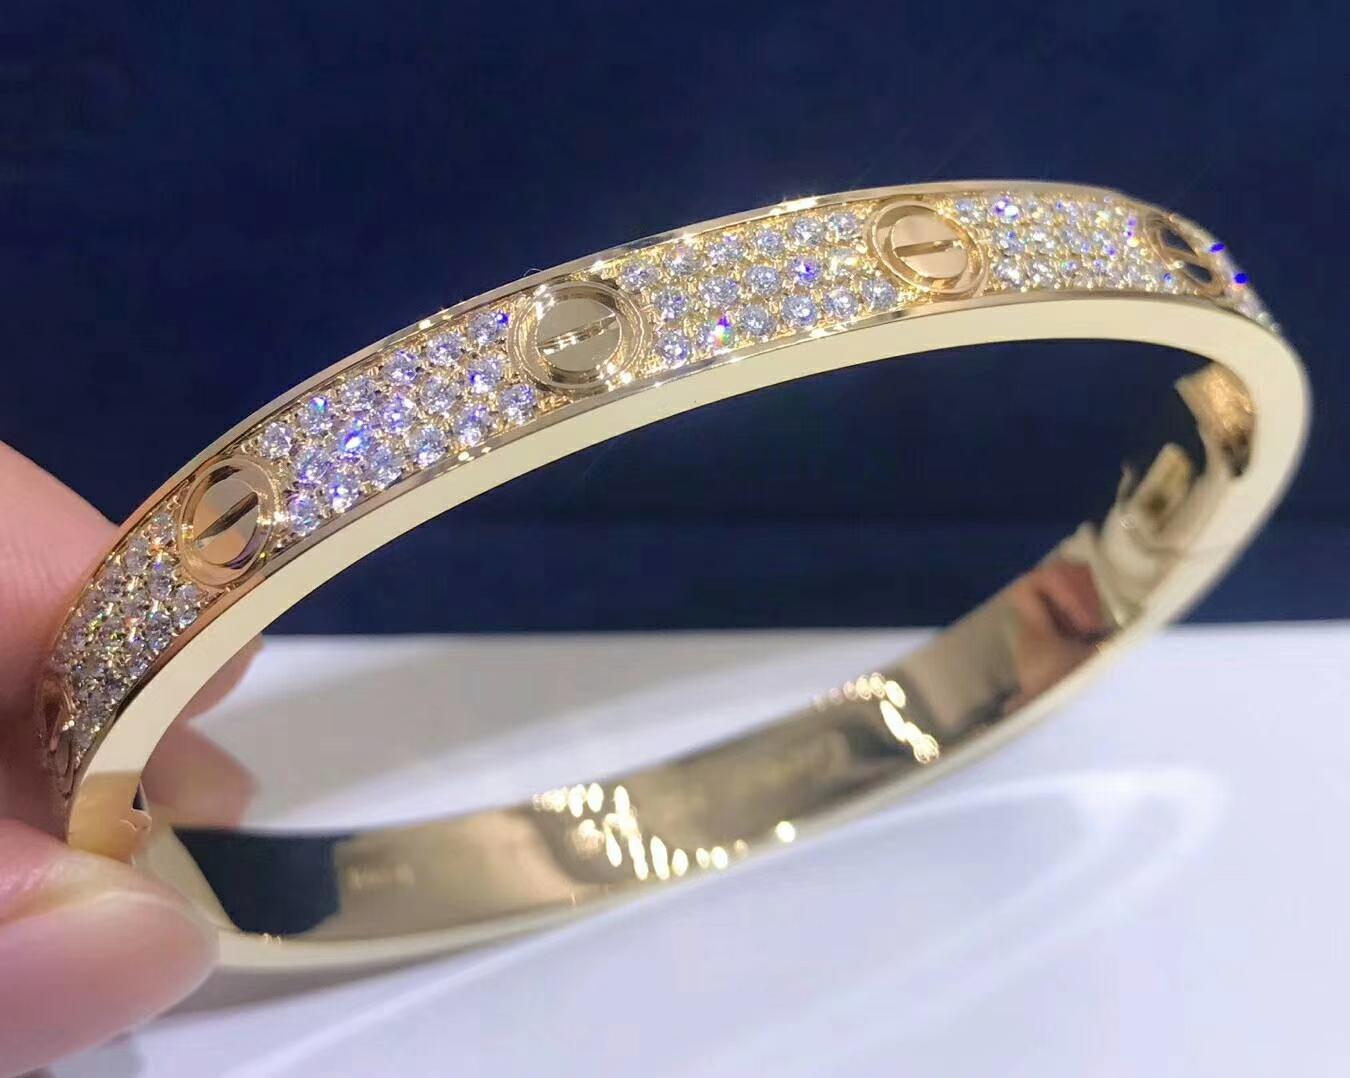 cartier love bracelet in 18k yellow gold 204 diamond paved. Black Bedroom Furniture Sets. Home Design Ideas